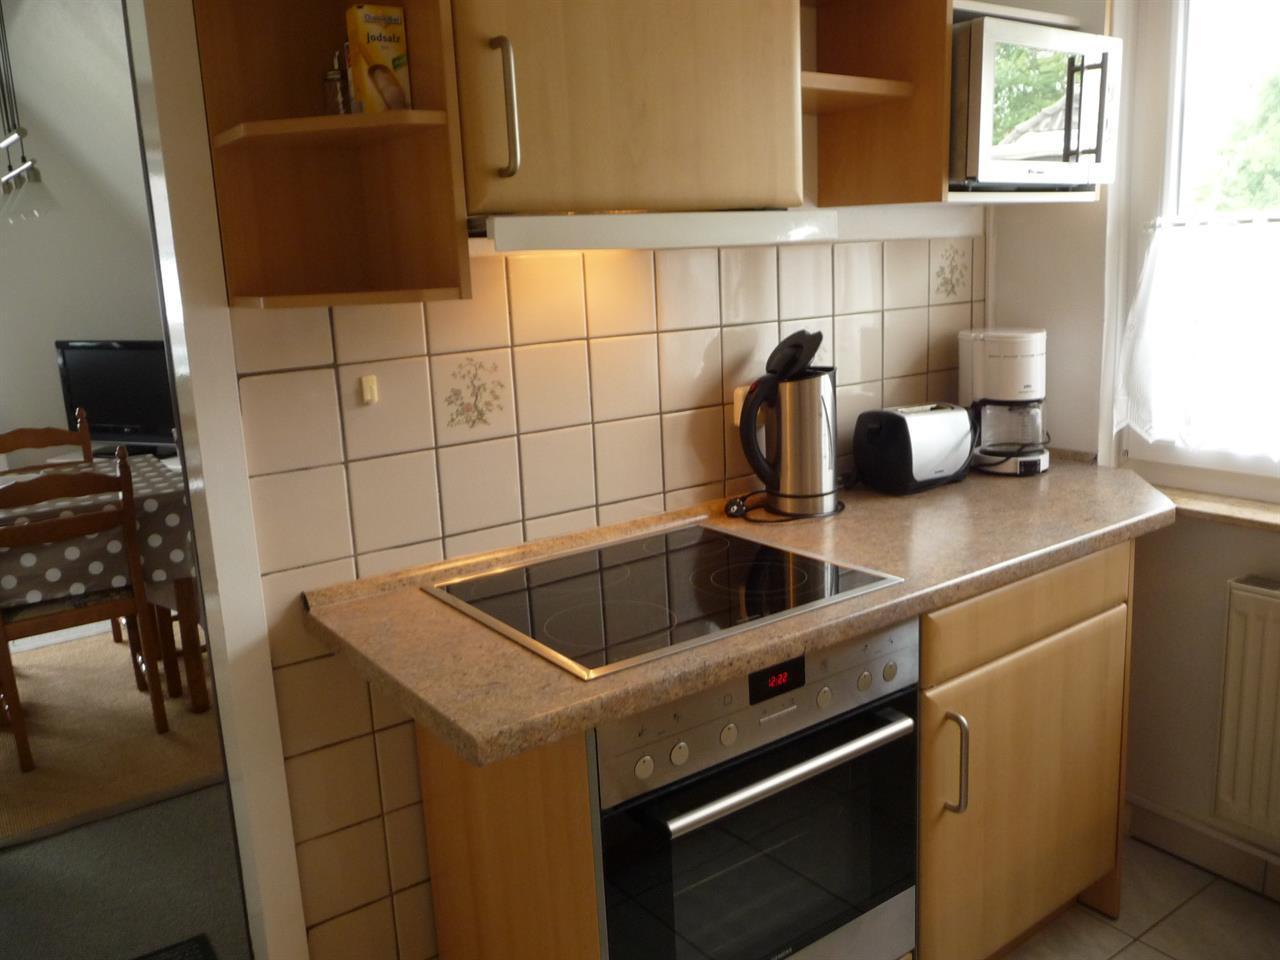 Appartement de vacances Rave (GKTZ) Wohnung 3 (2473421), Sankt Peter-Ording, Frise du Nord, Schleswig-Holstein, Allemagne, image 17